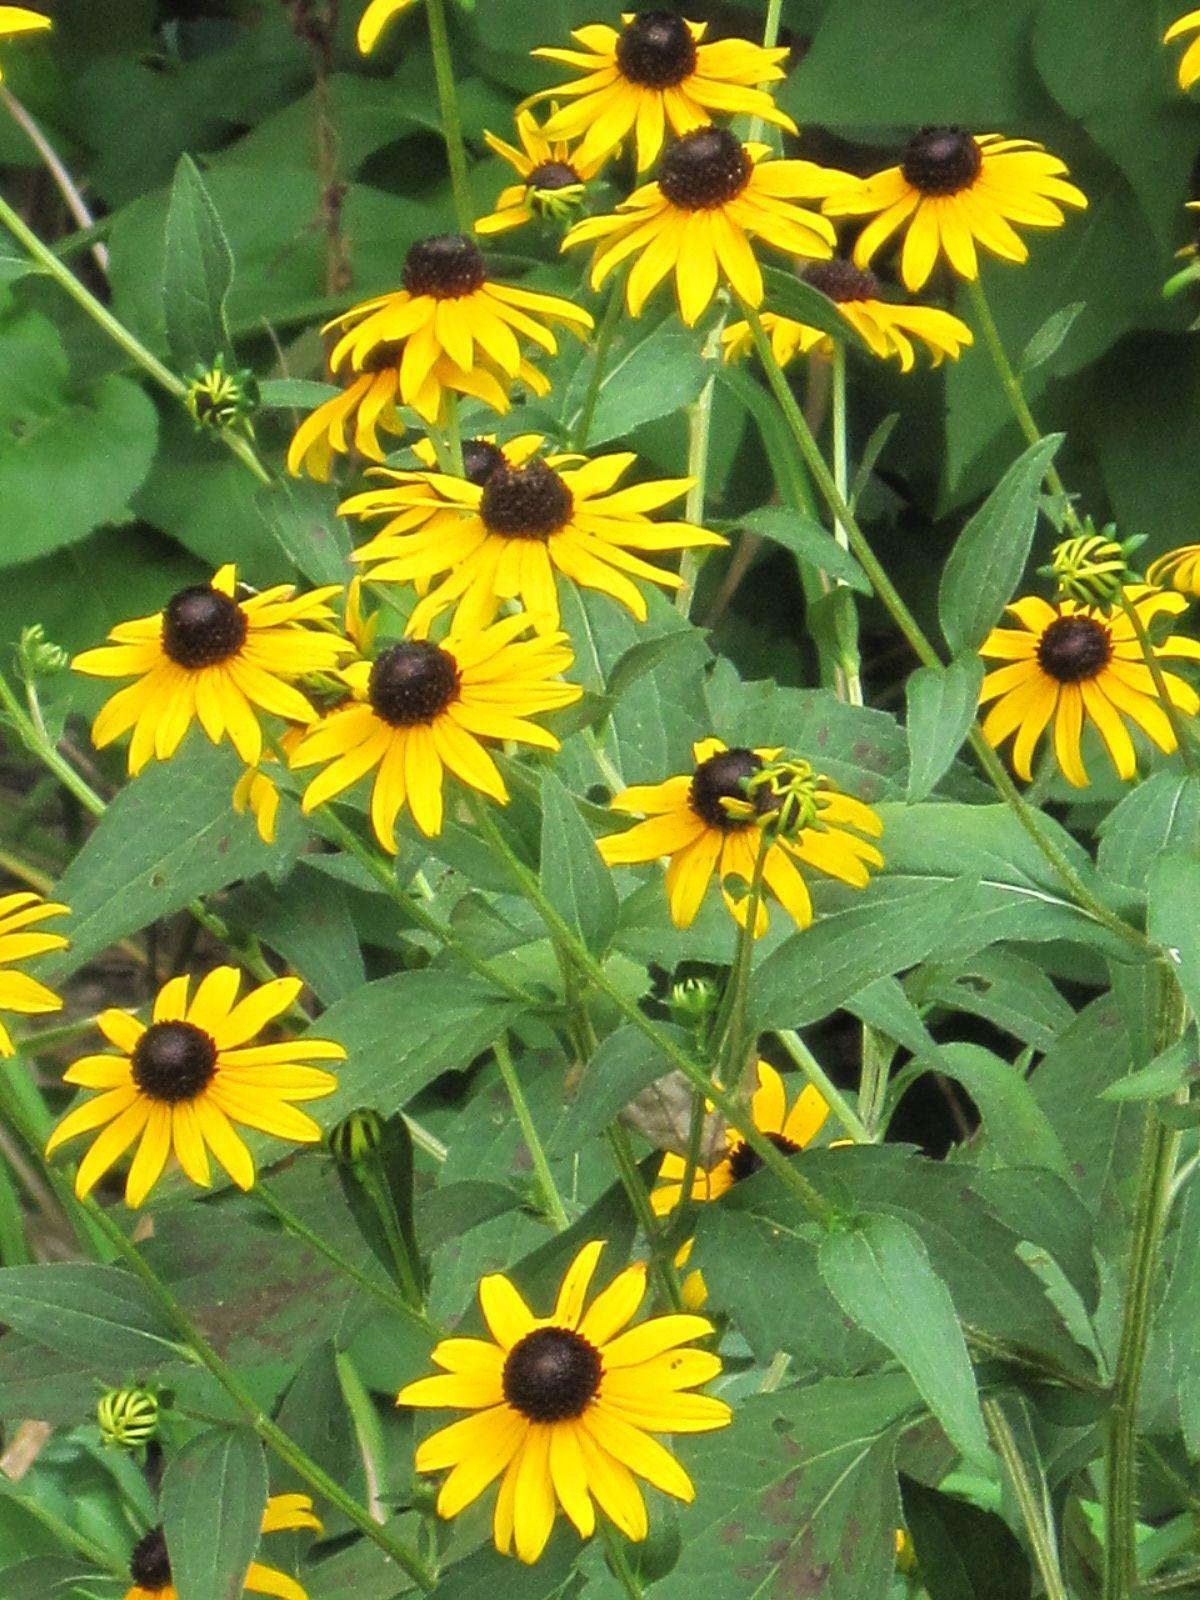 Black eyed susan perennial bloom early summer until